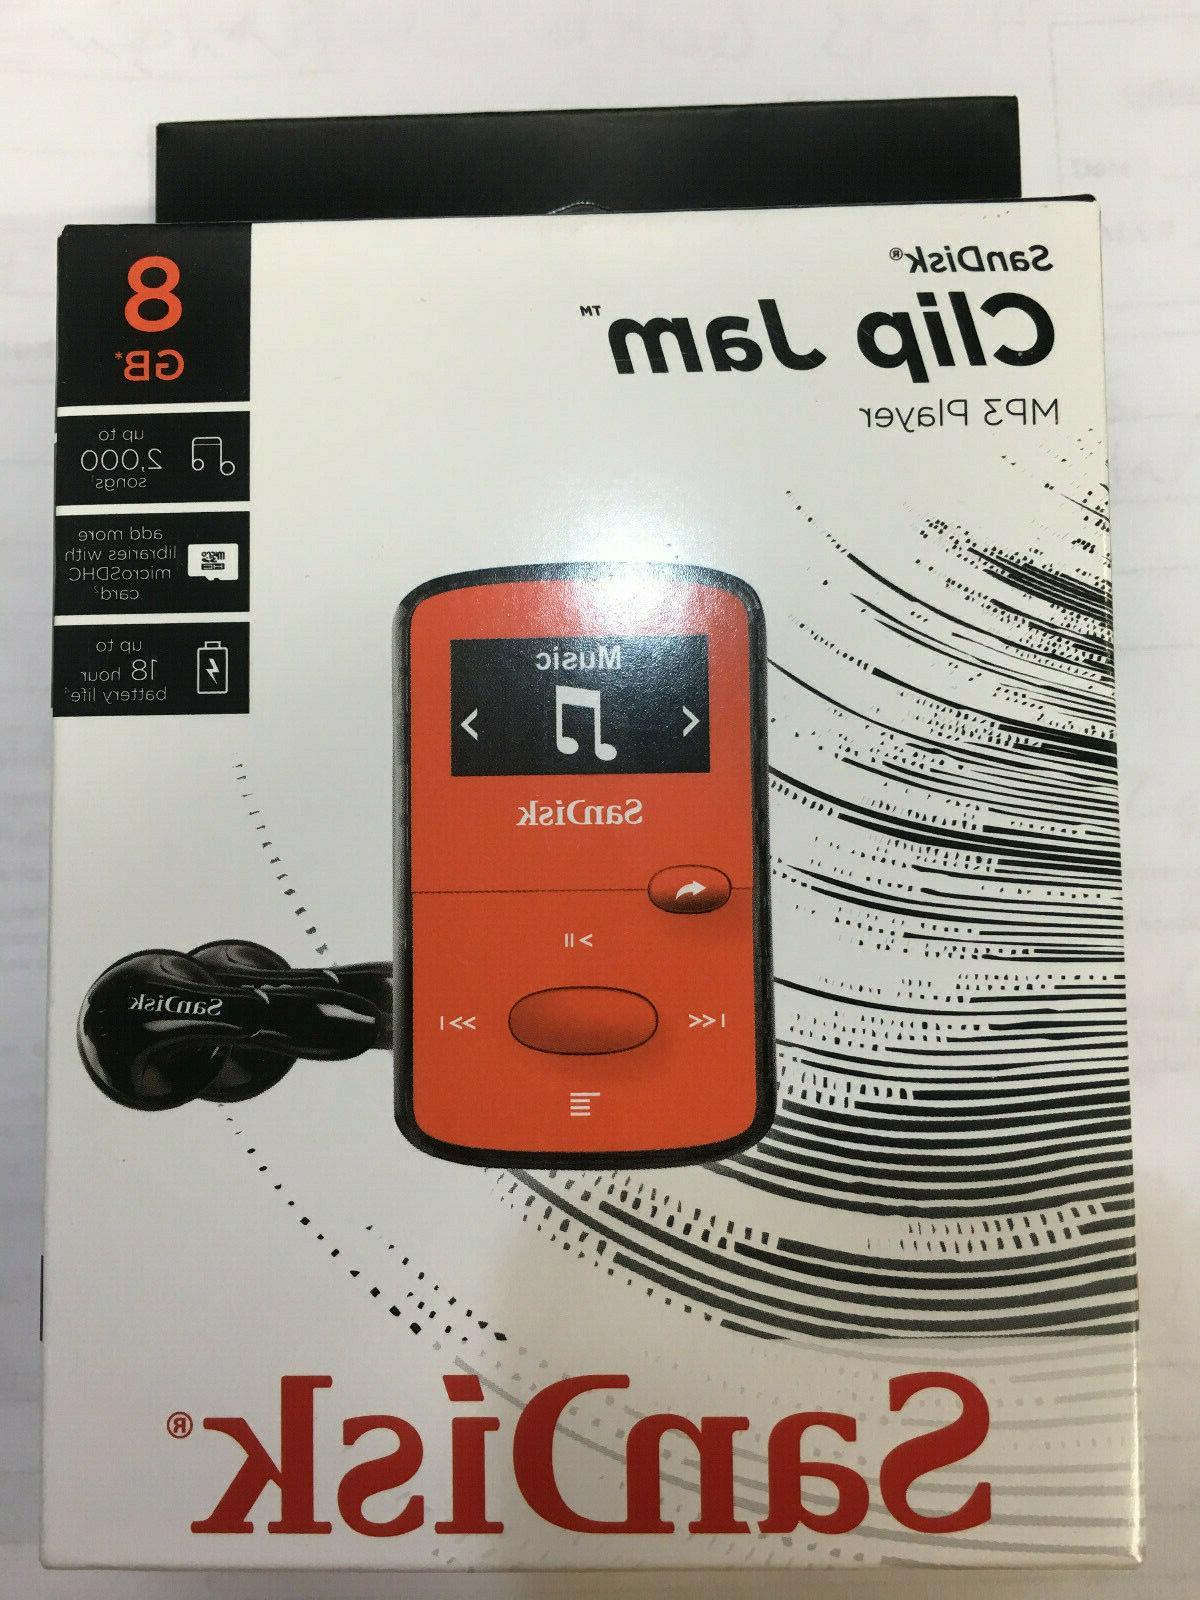 SanDisk - Clip Jam 8GB* MP3 Player - Red & Black